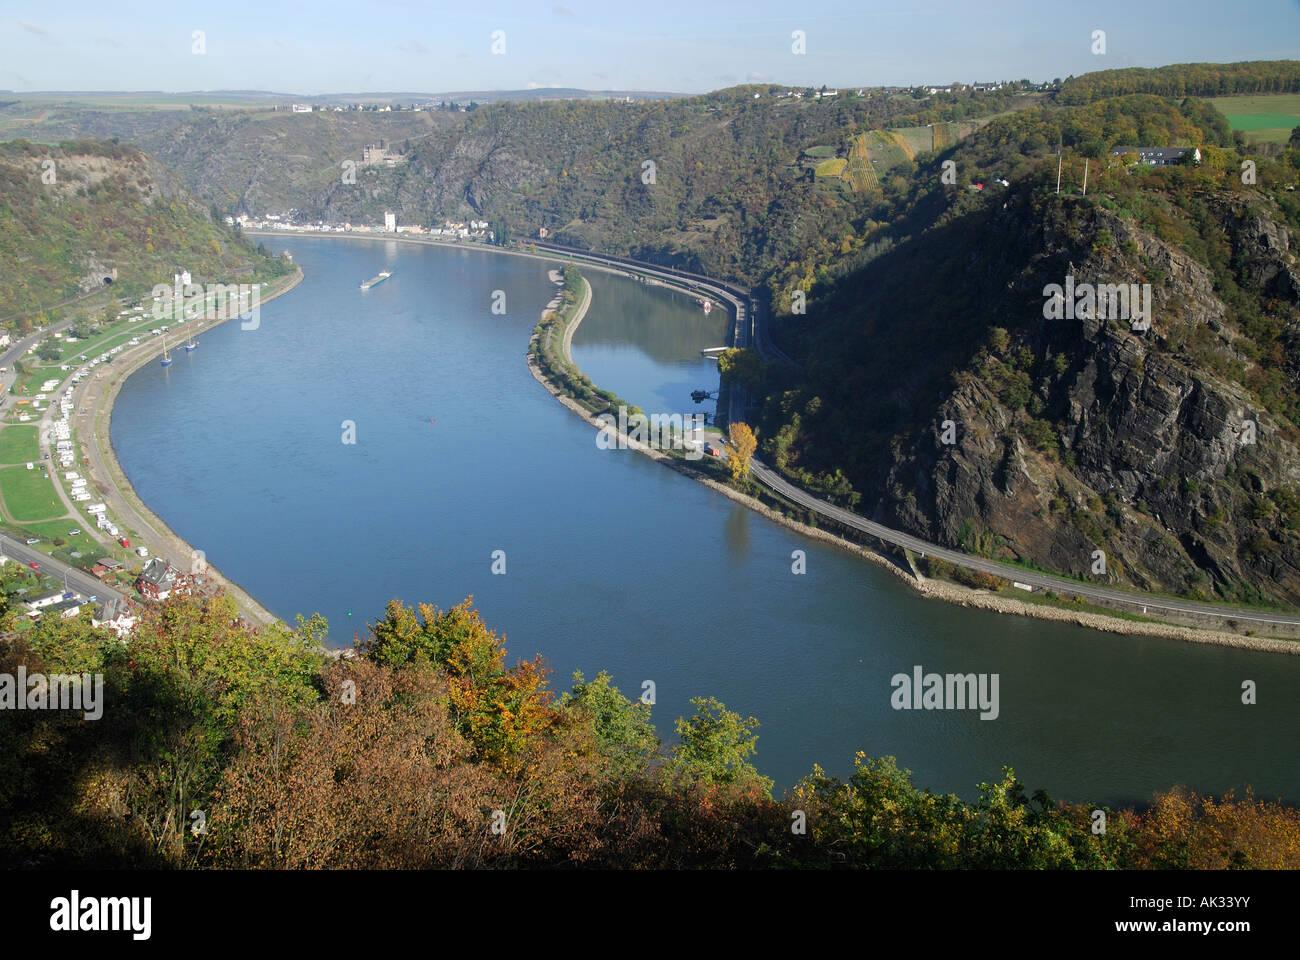 Legendary Loreley rock, Rhine valley, Germany Stock Photo